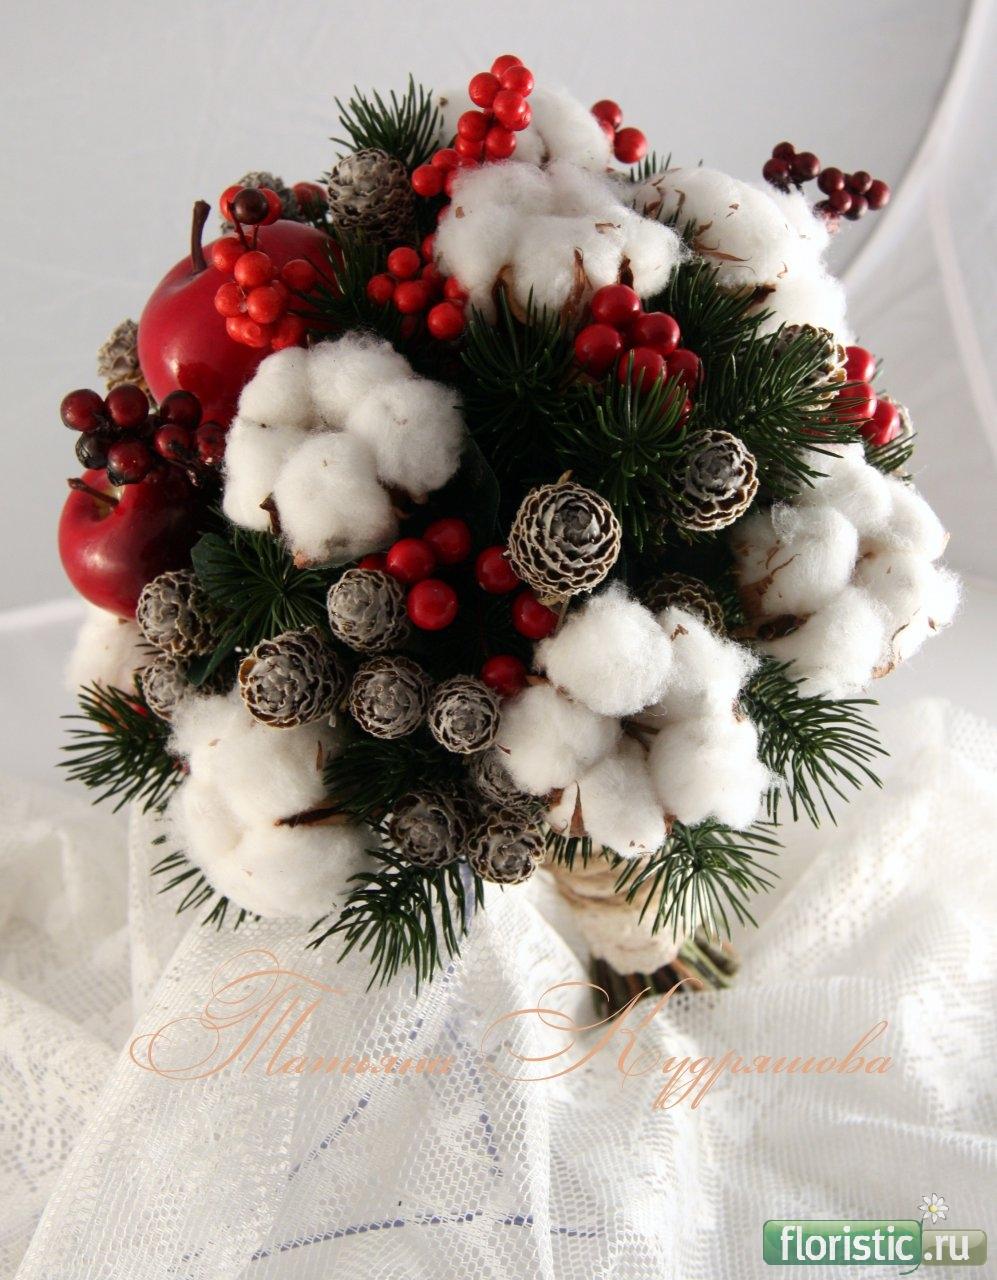 http://www.floristic.ru/forum/attachments/604663d1387142747-svadebnaya-floristika-img_2324.jpg